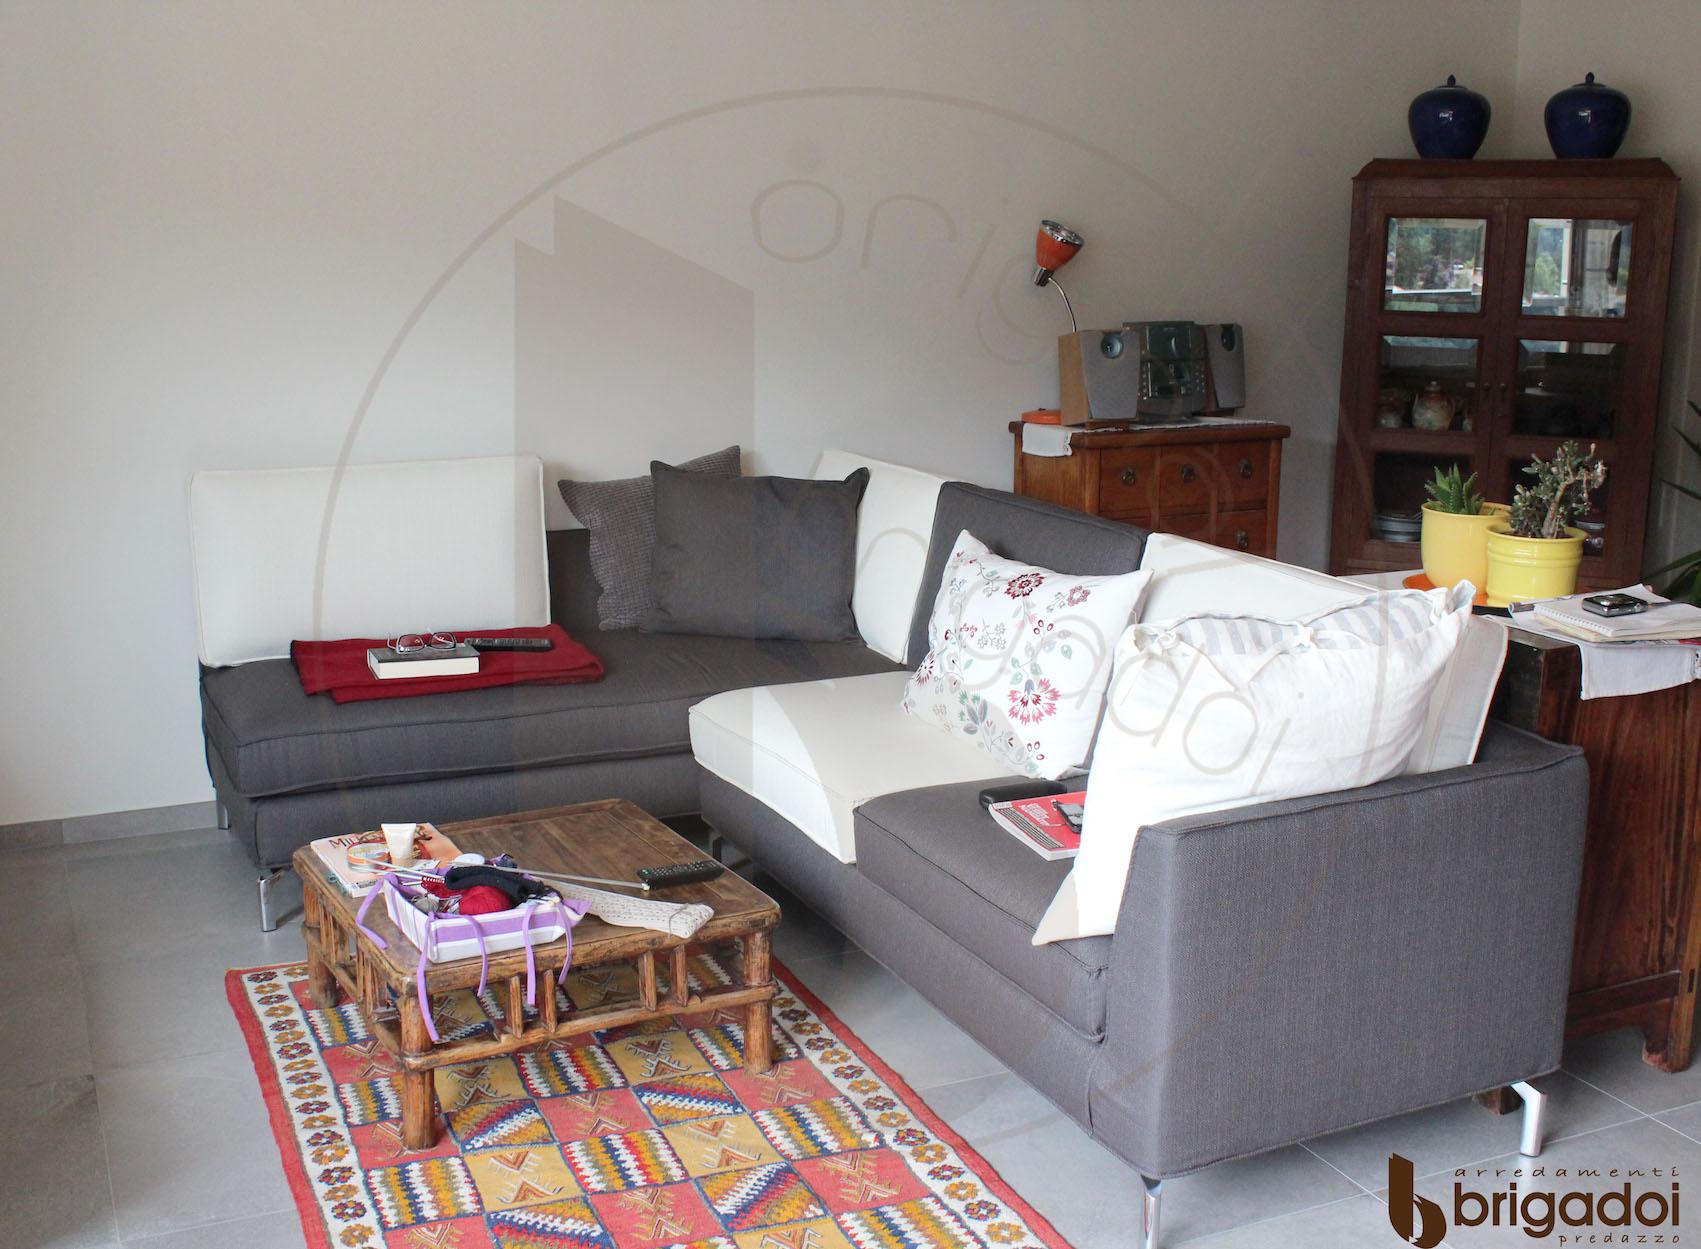 divano arredamenti brigadoi falegnameria val di fiemme trentino